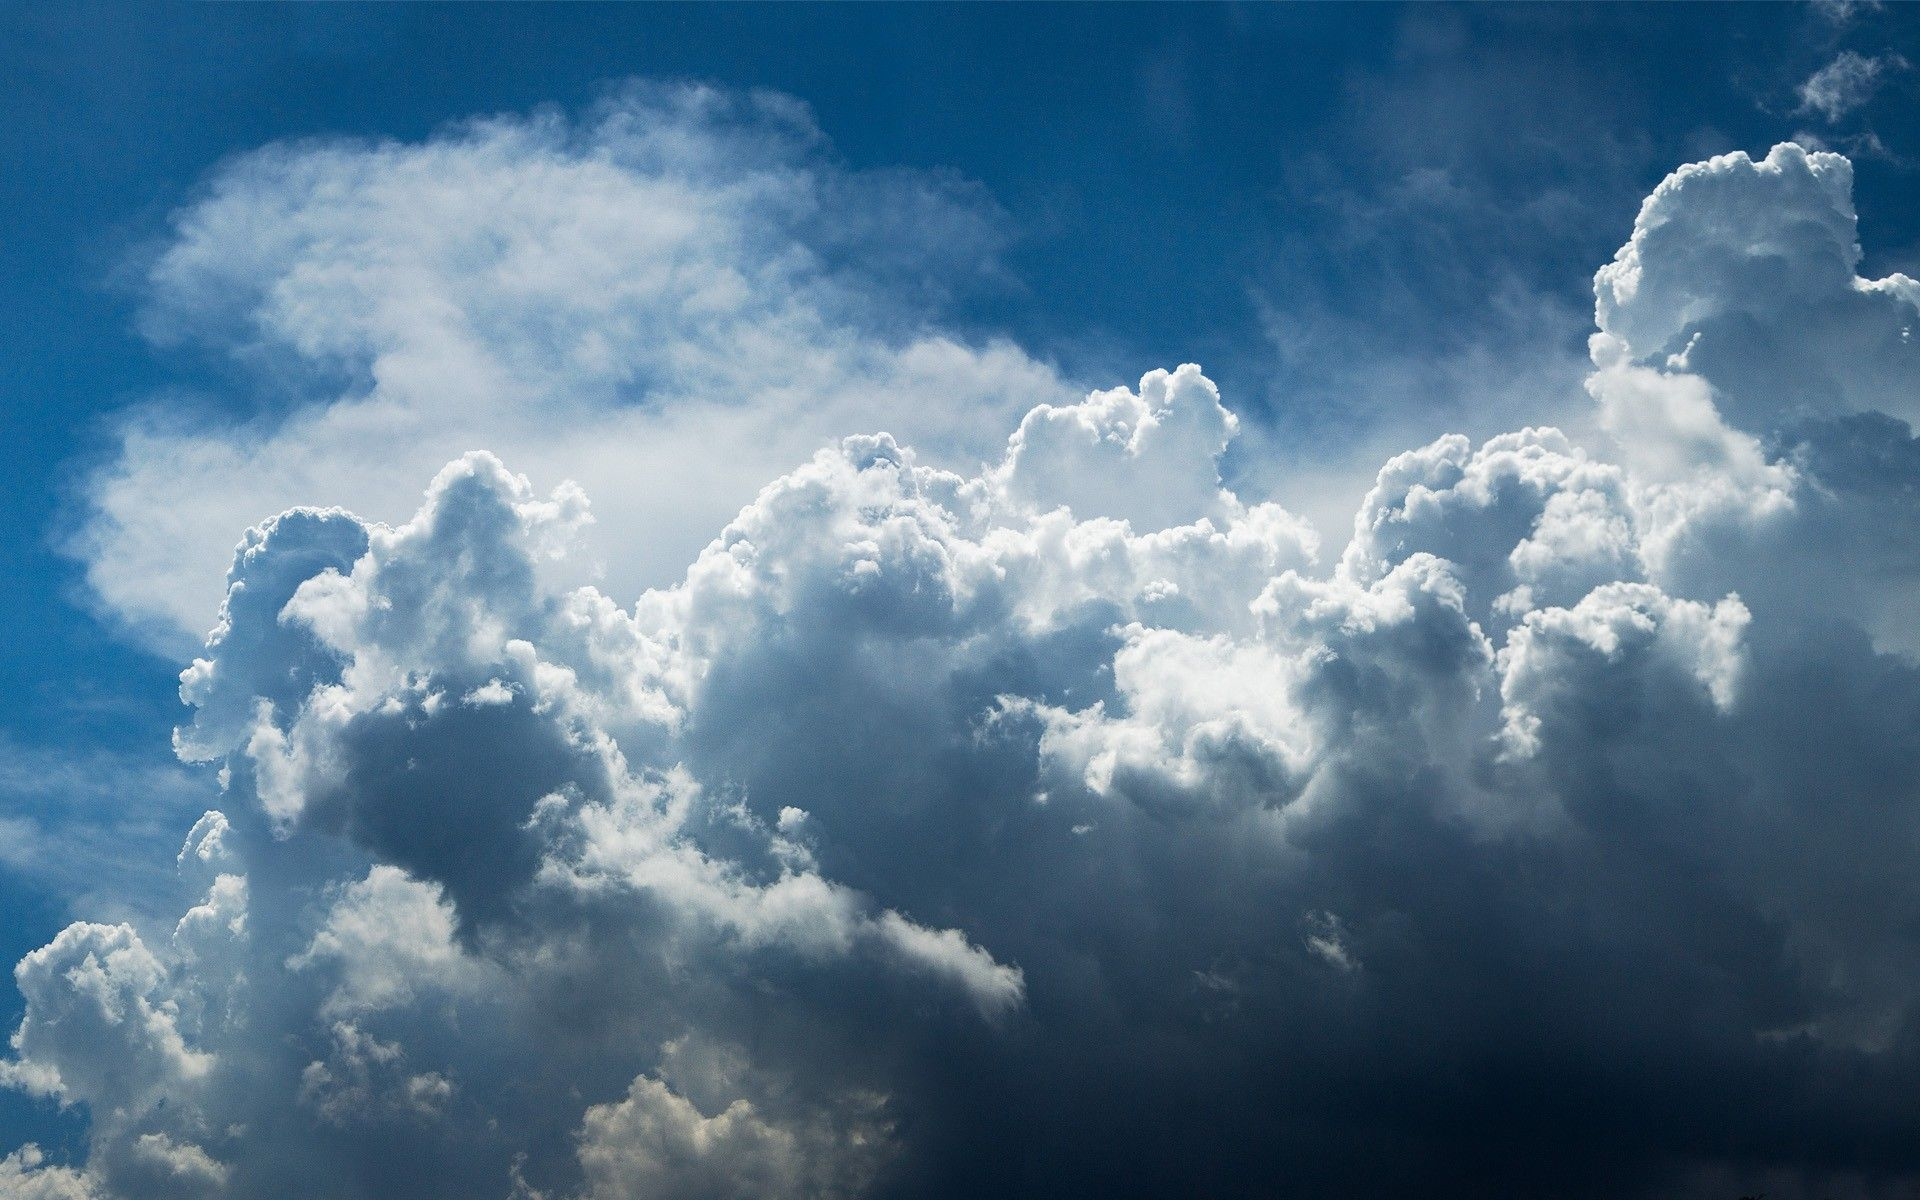 Cloud Wallpapers HD 1920x1200